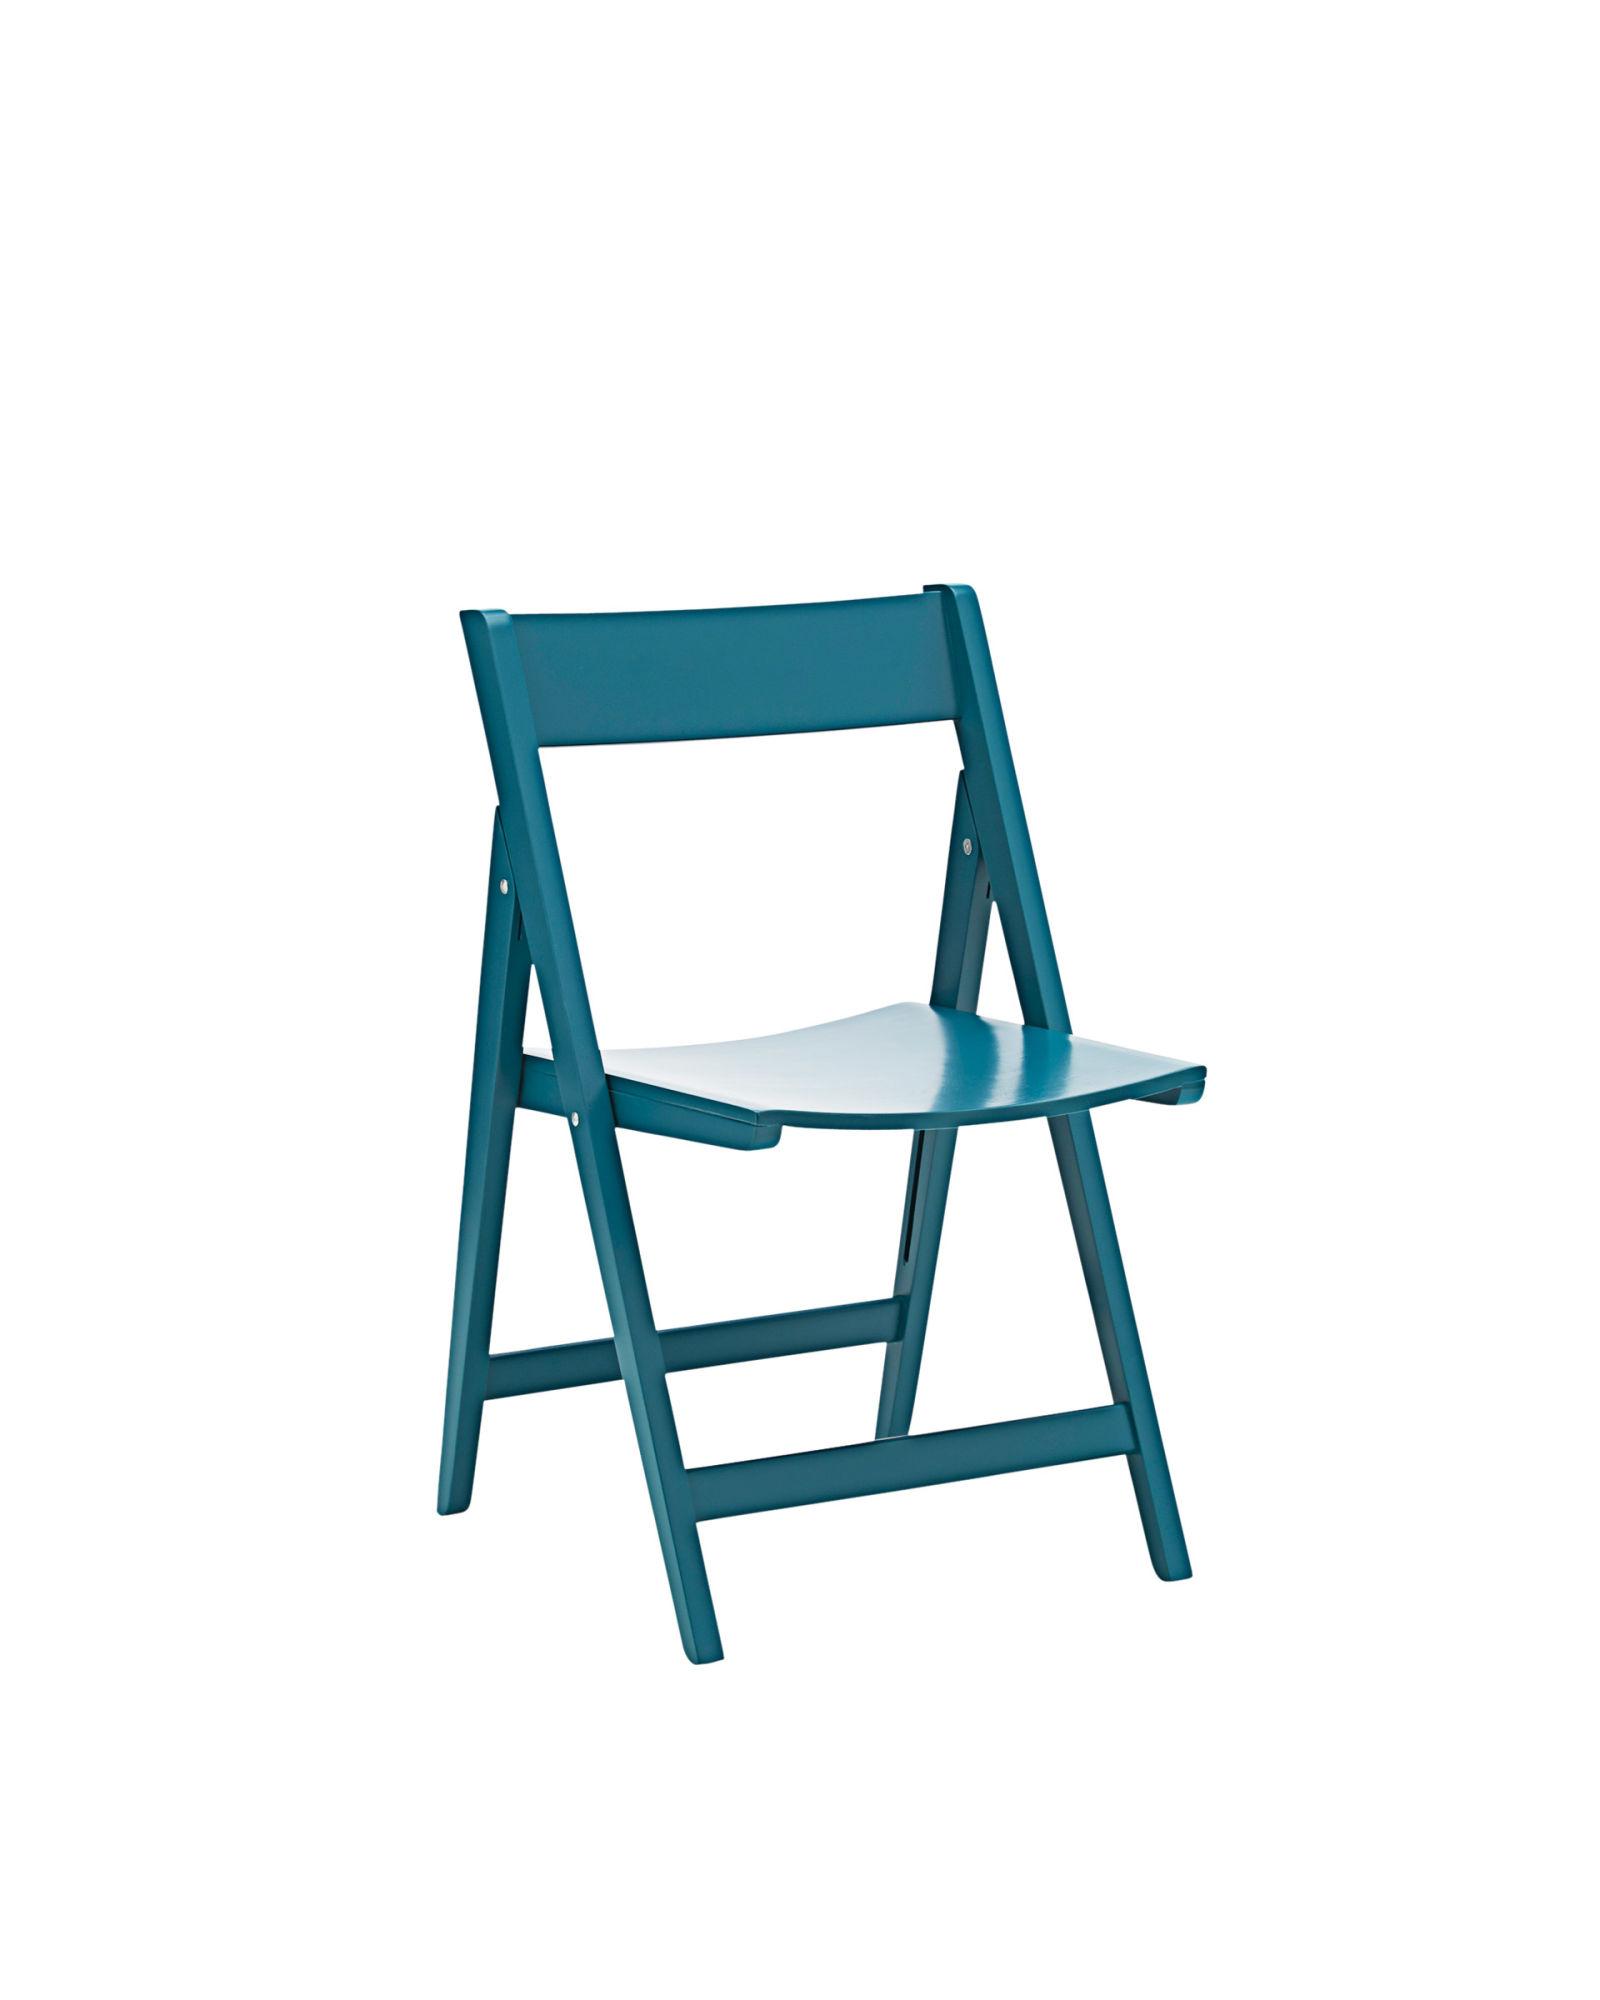 Designer camping chairs - Designer Camping Chairs 22